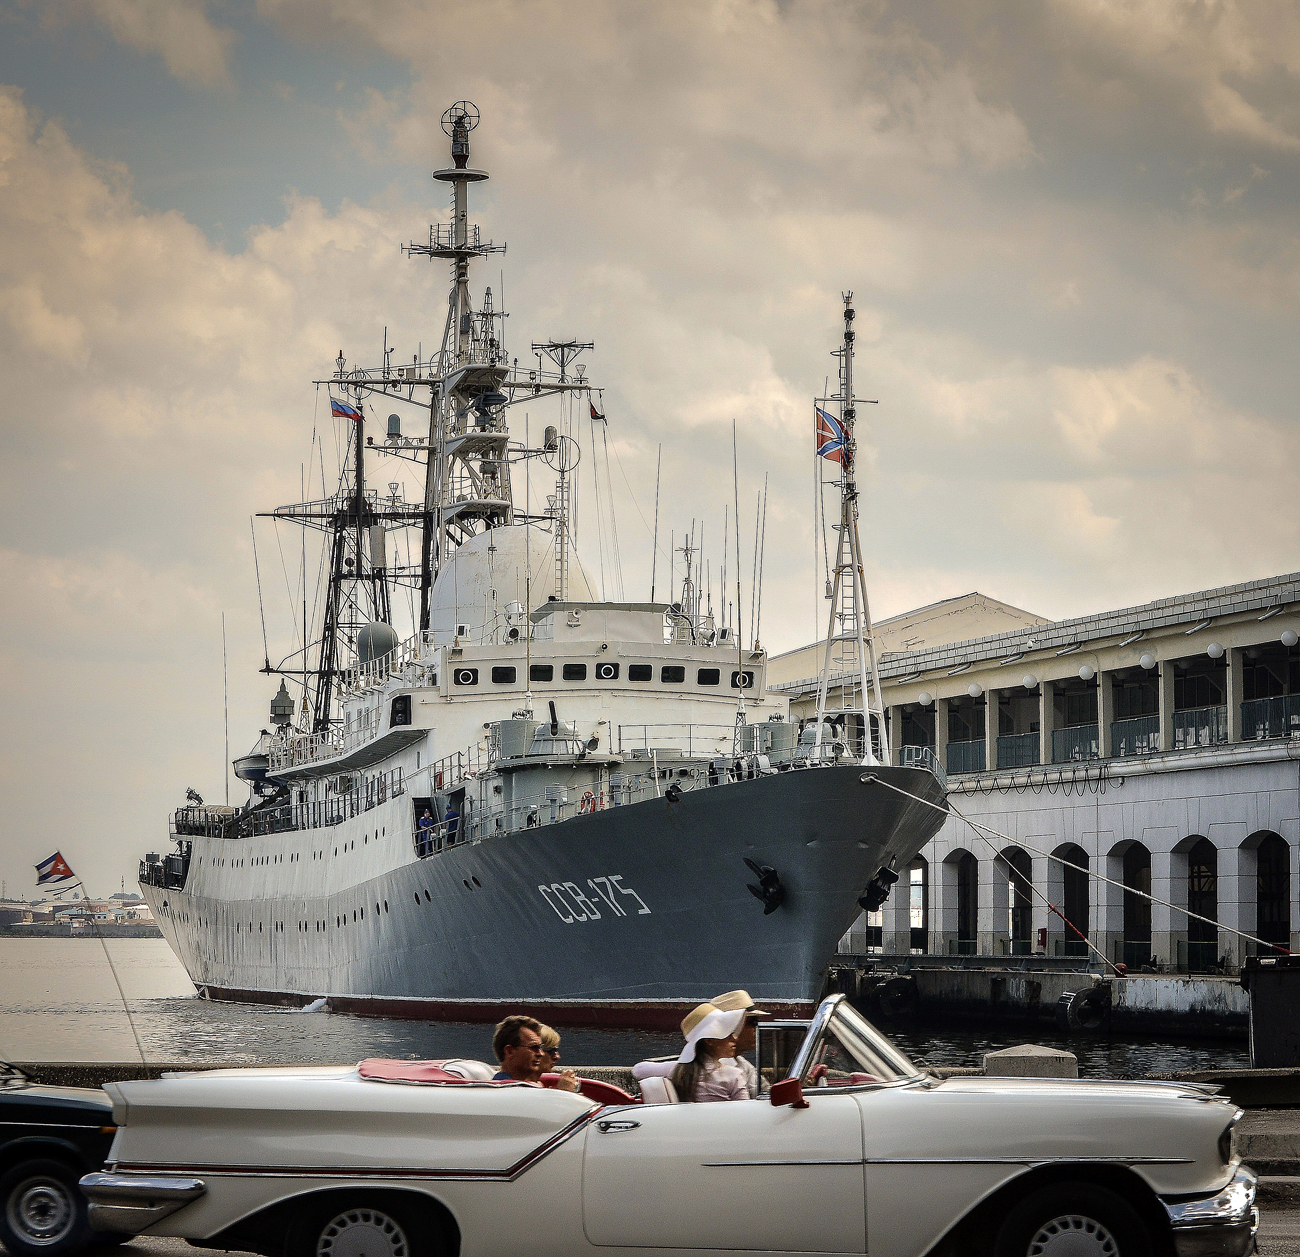 Kapal Vishnya (juga dikenal sebagai Meridian) adalah kapal perang kelas CCB-175 Viktor Leonov. Sumber: Reuters